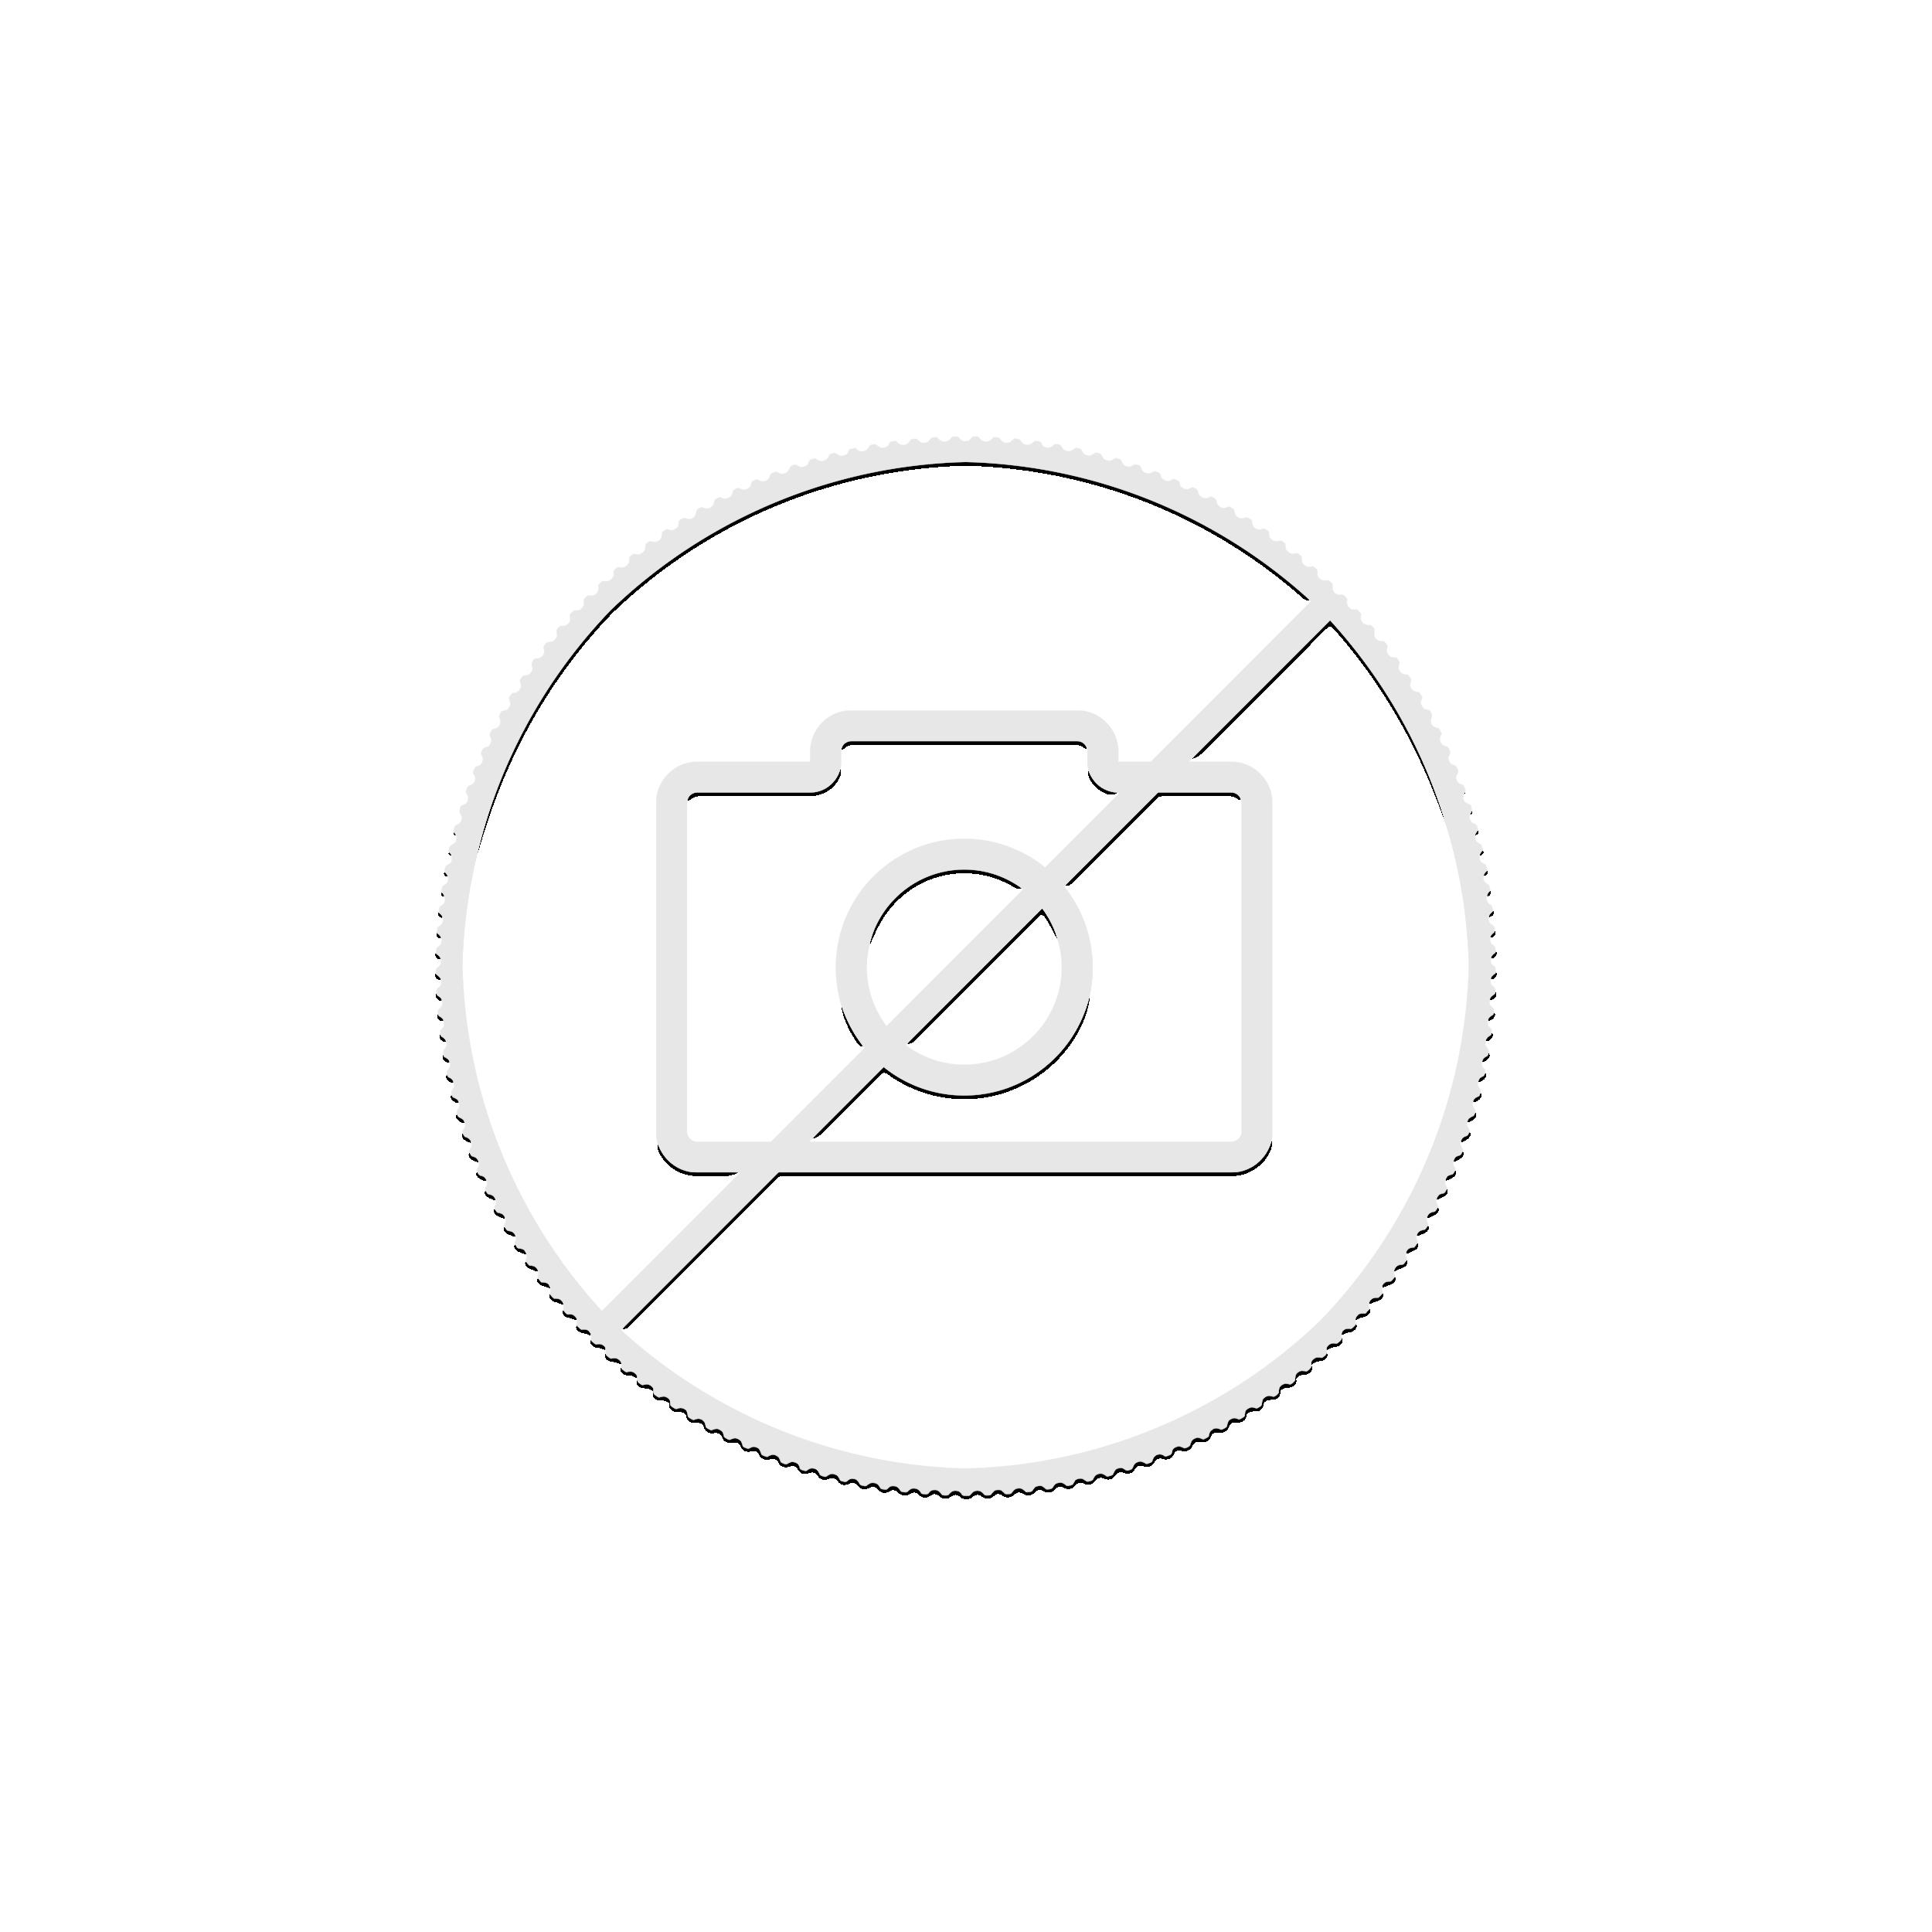 1 Troy ounce zilveren munt Lunar UK 2020